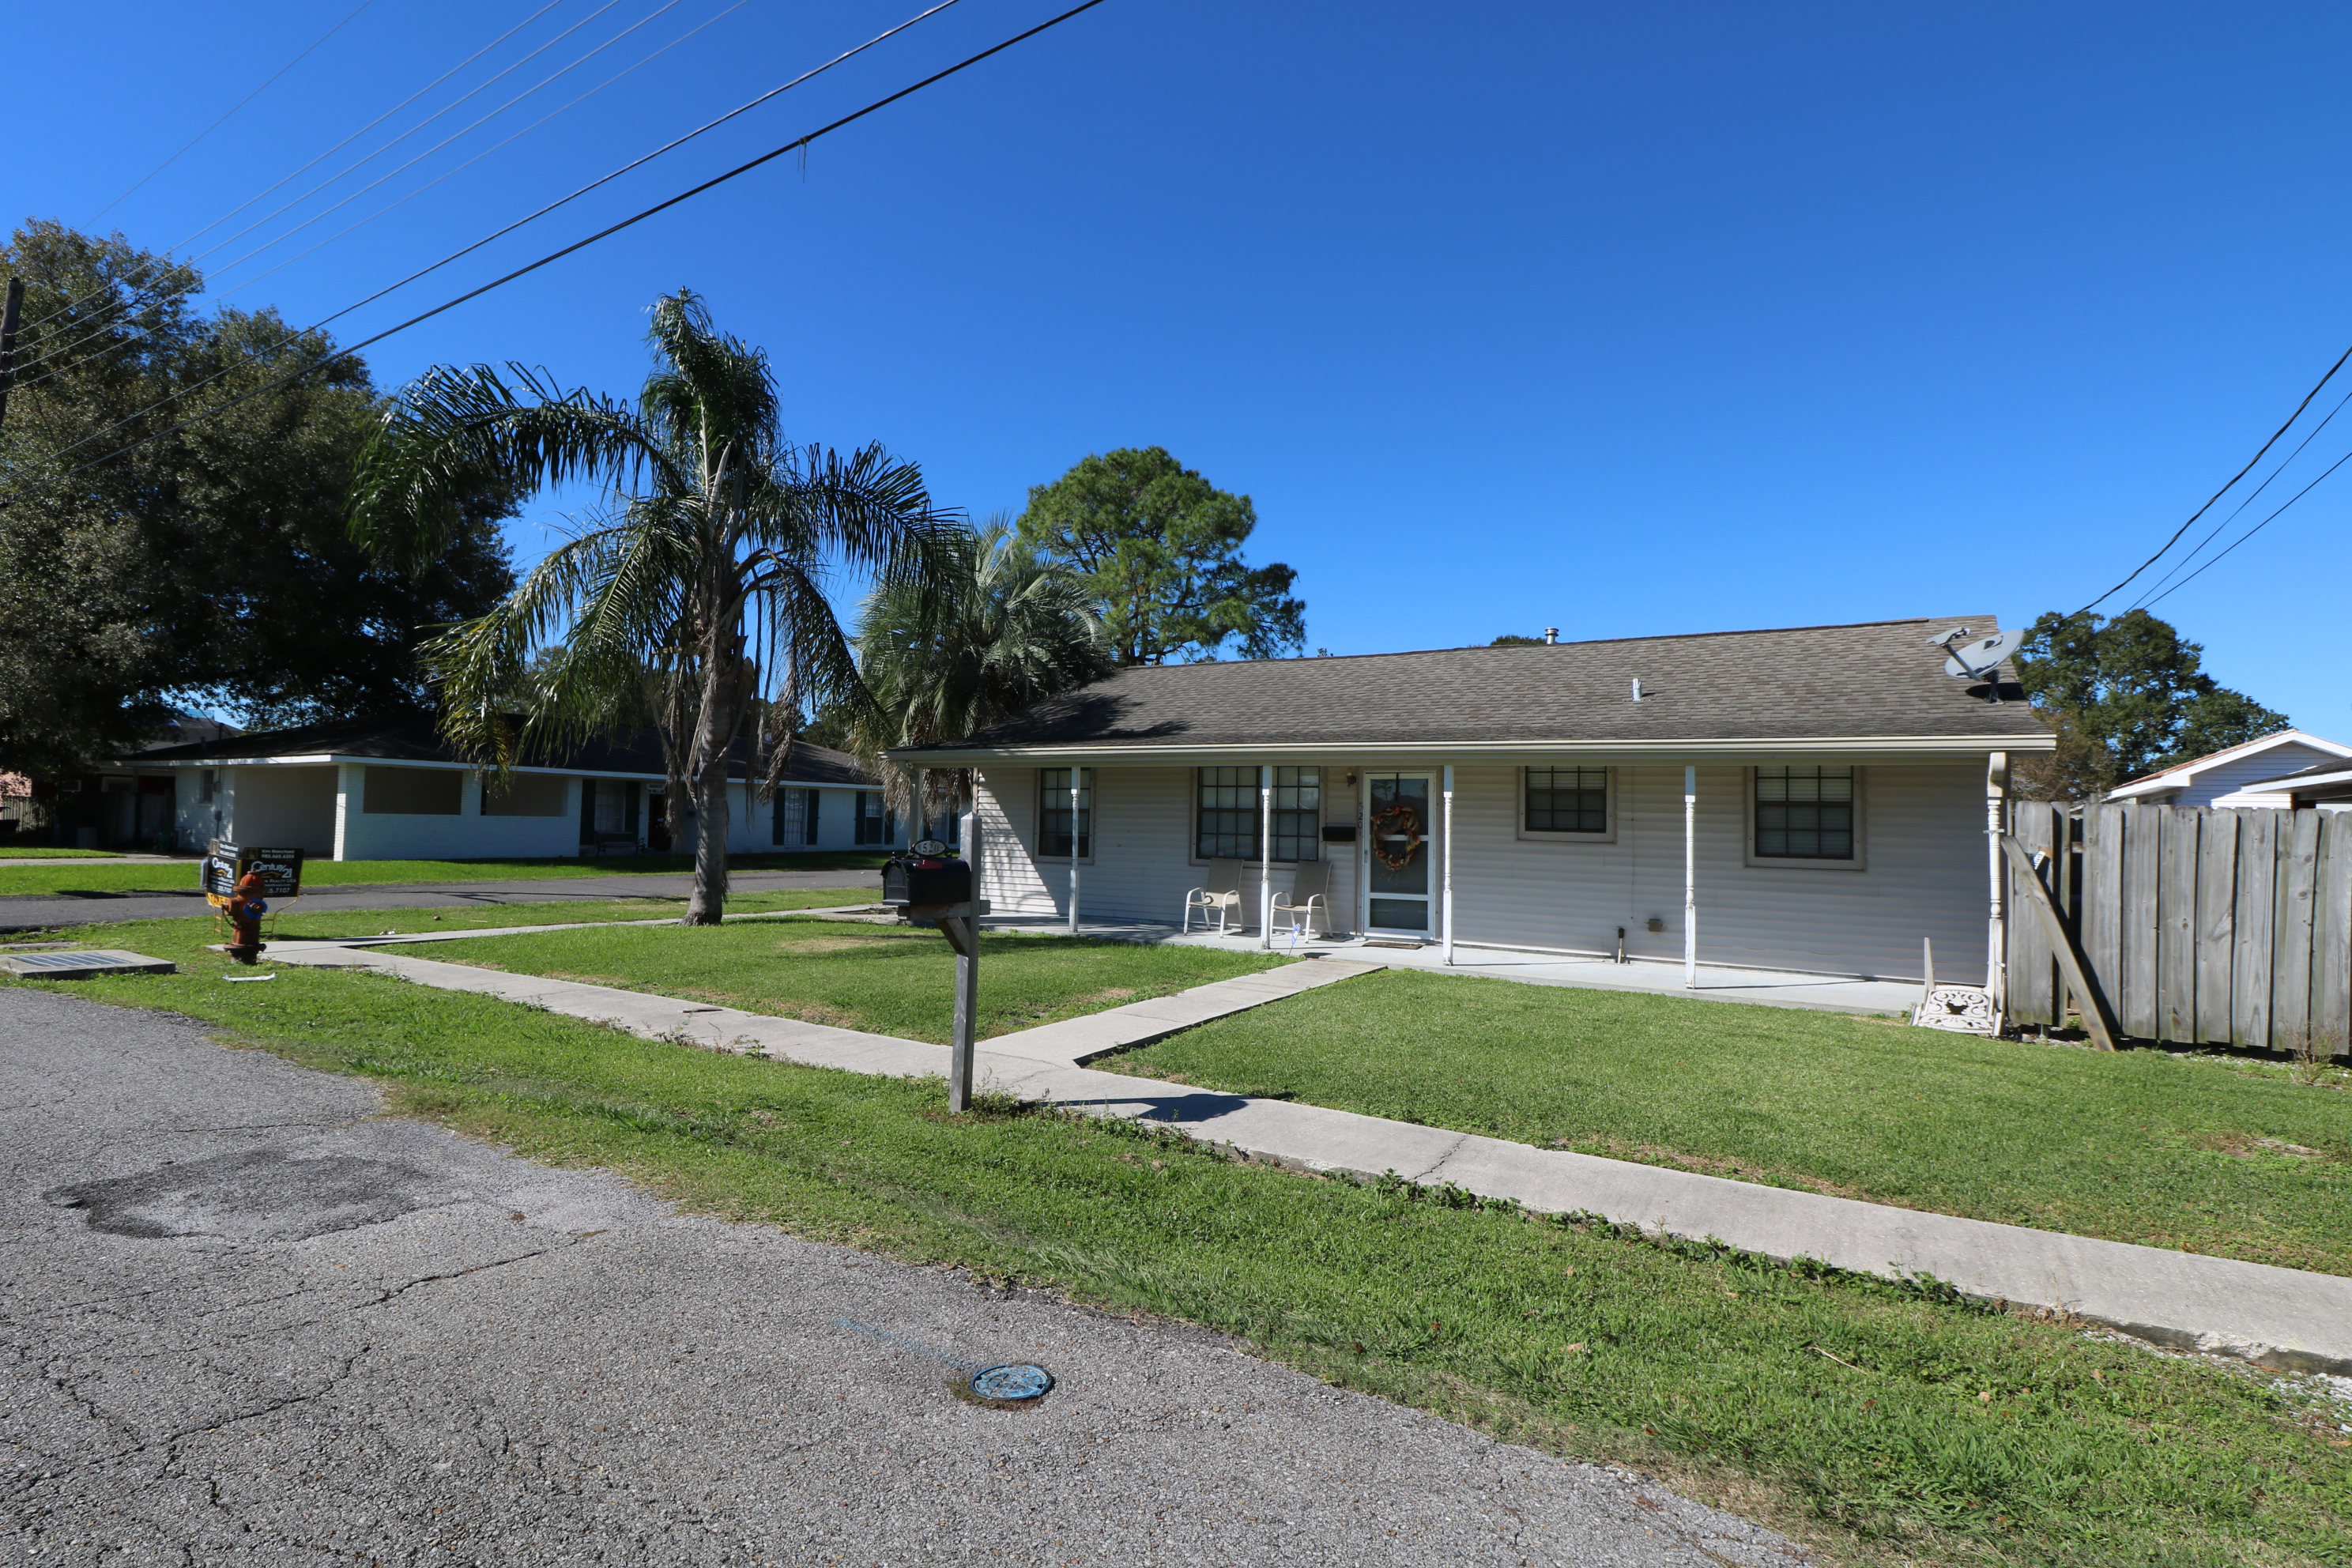 520 ELIZABETH STREET, Lockport, Louisiana 70374